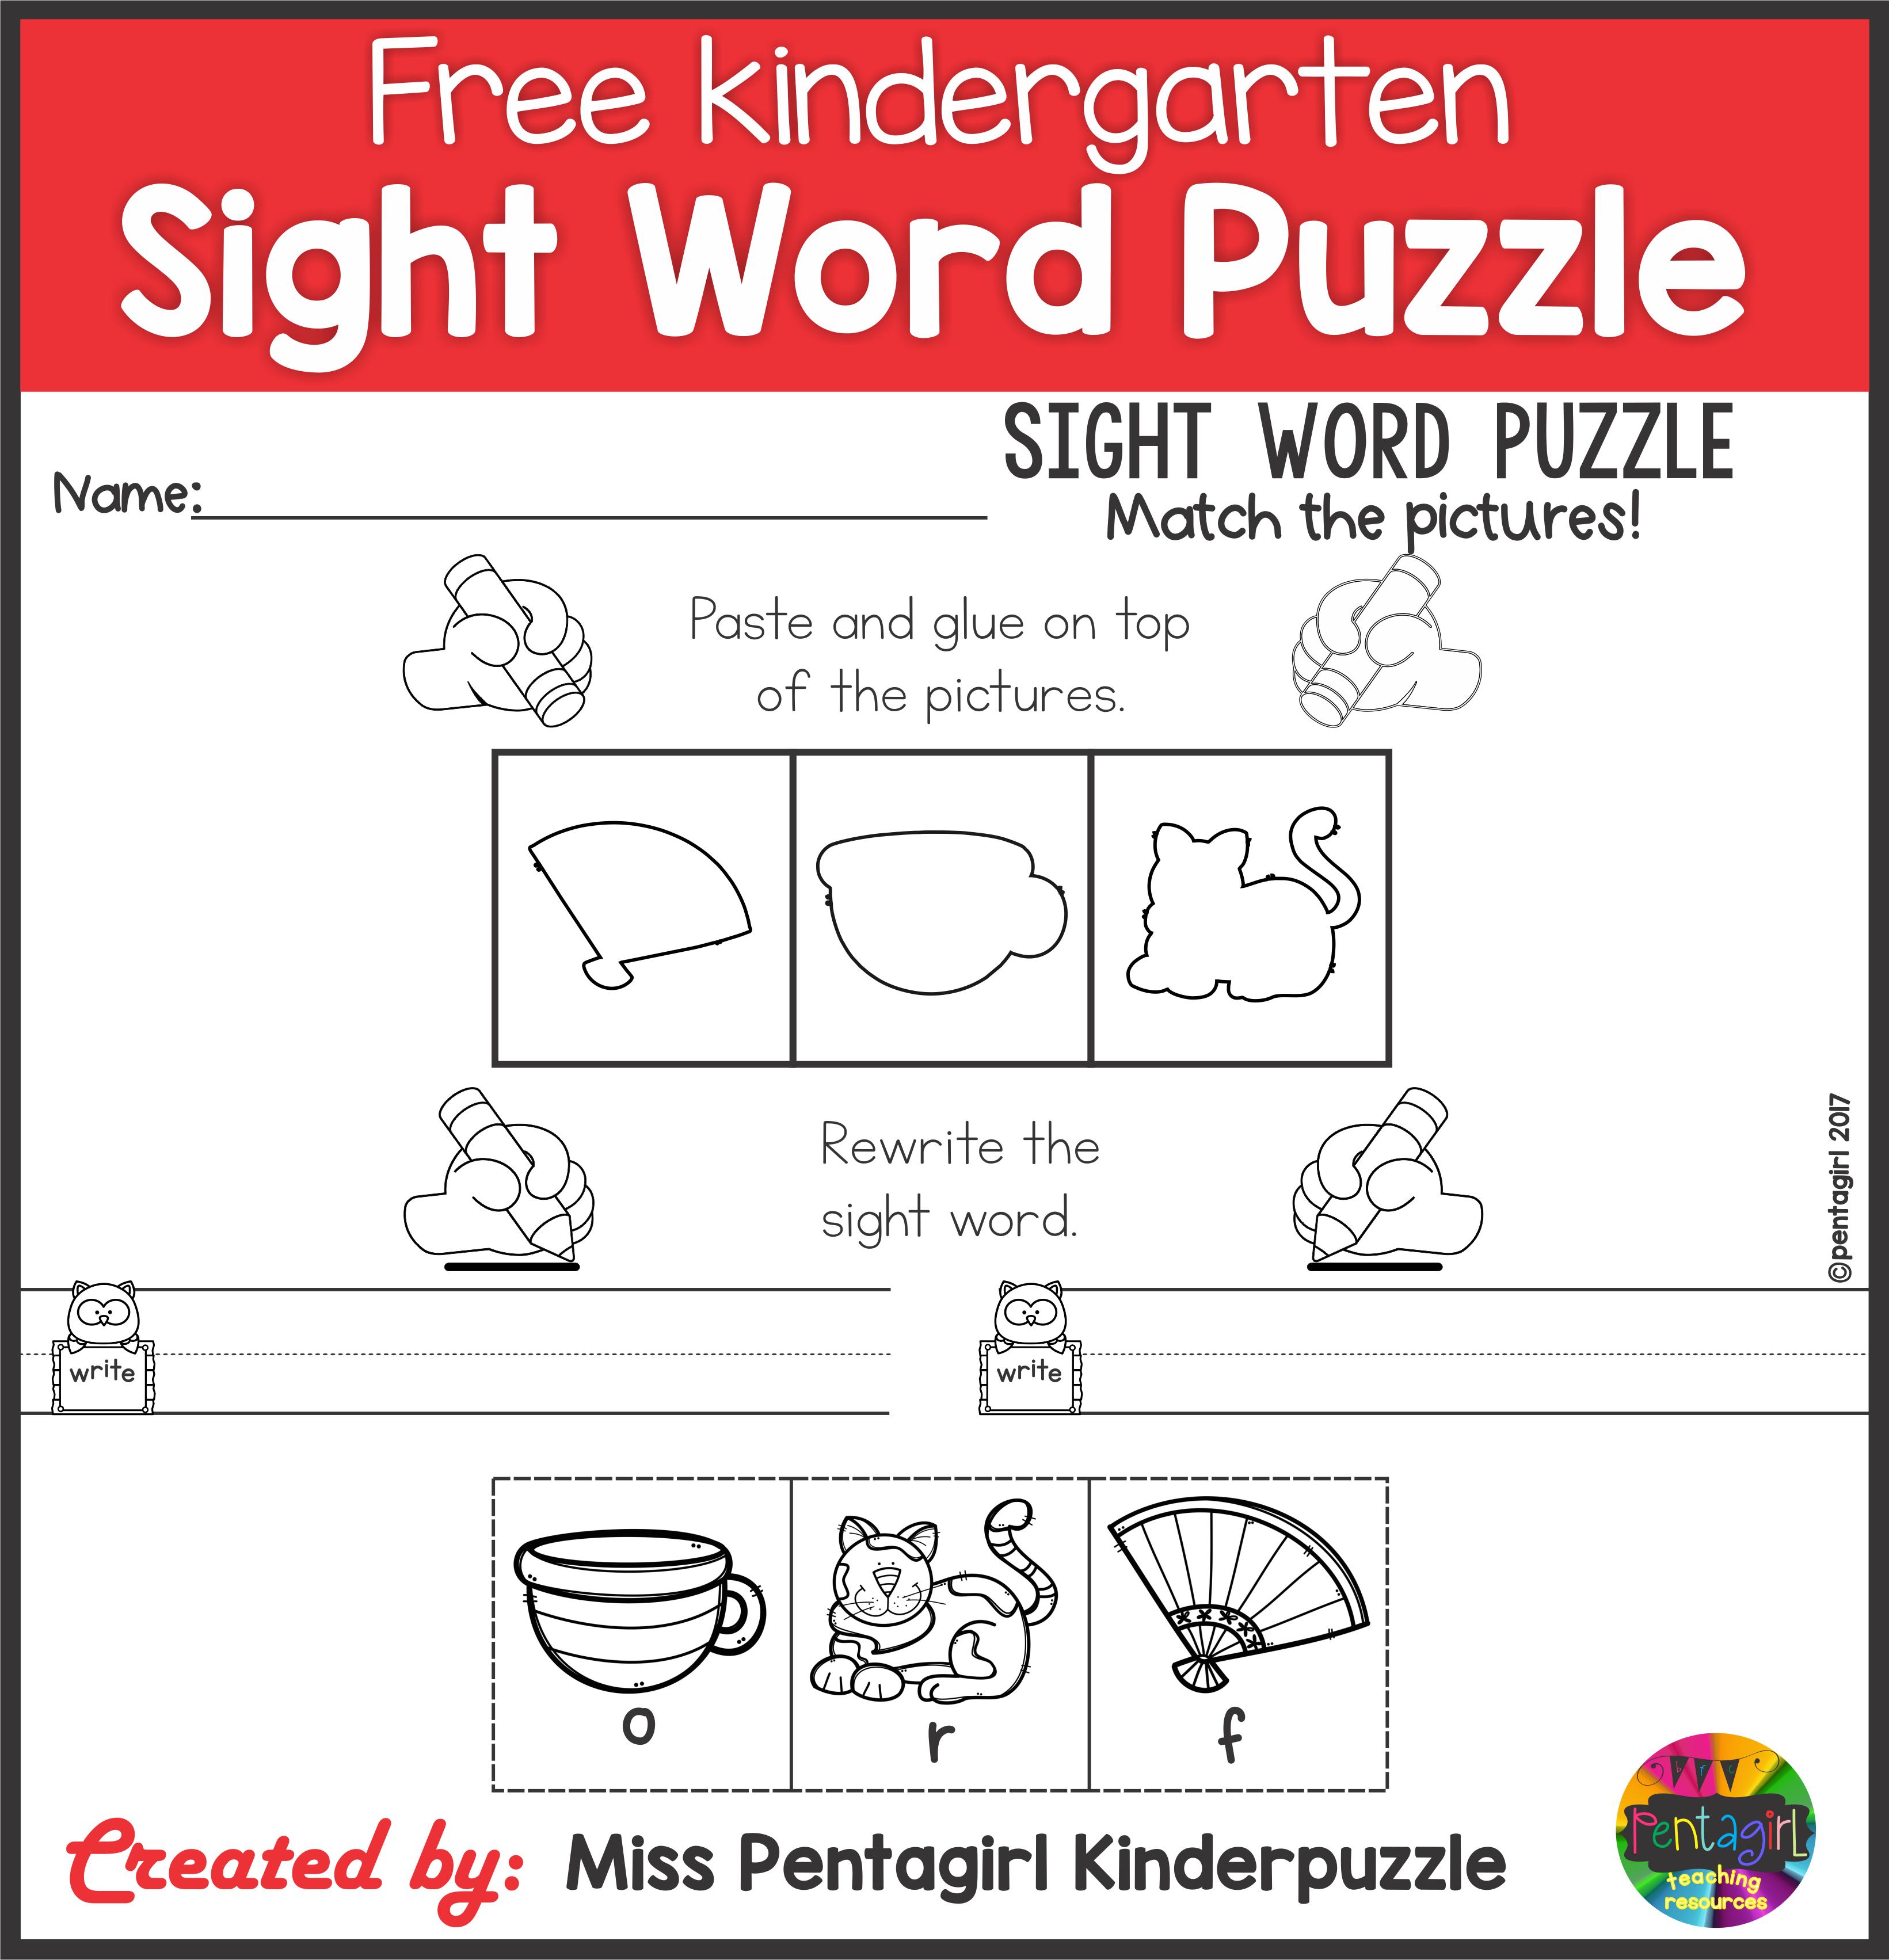 Free Kindergarten Sight Word Puzzle